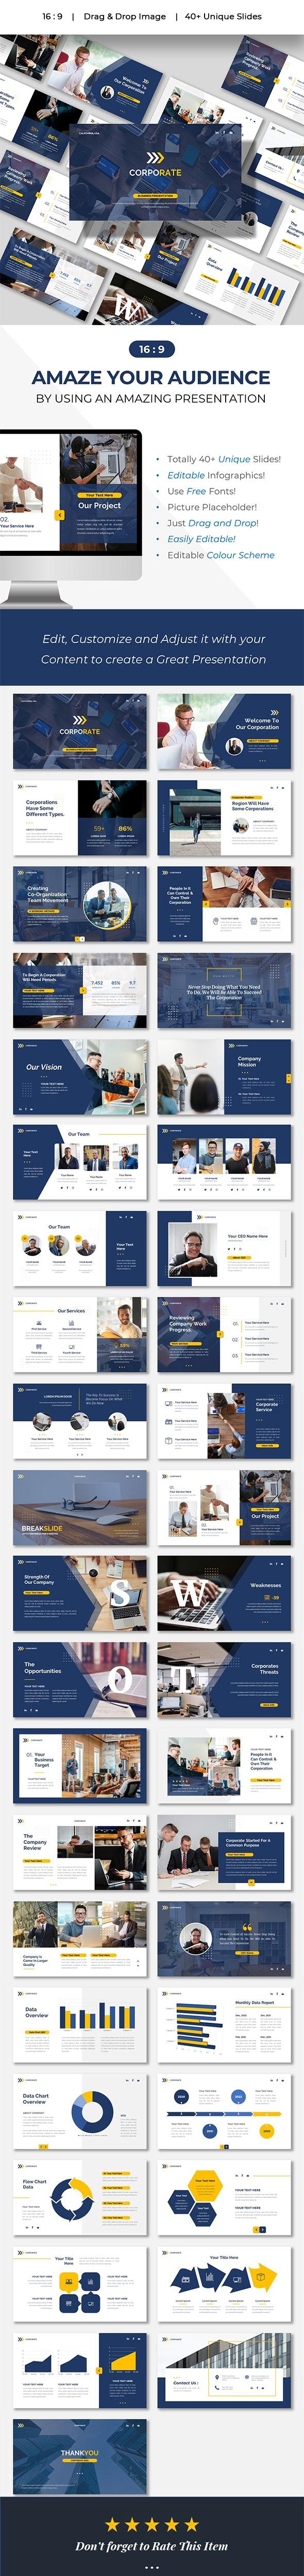 CORPORATE - Company Business Presentation Powerpoints Template - Business PowerPoint Templates